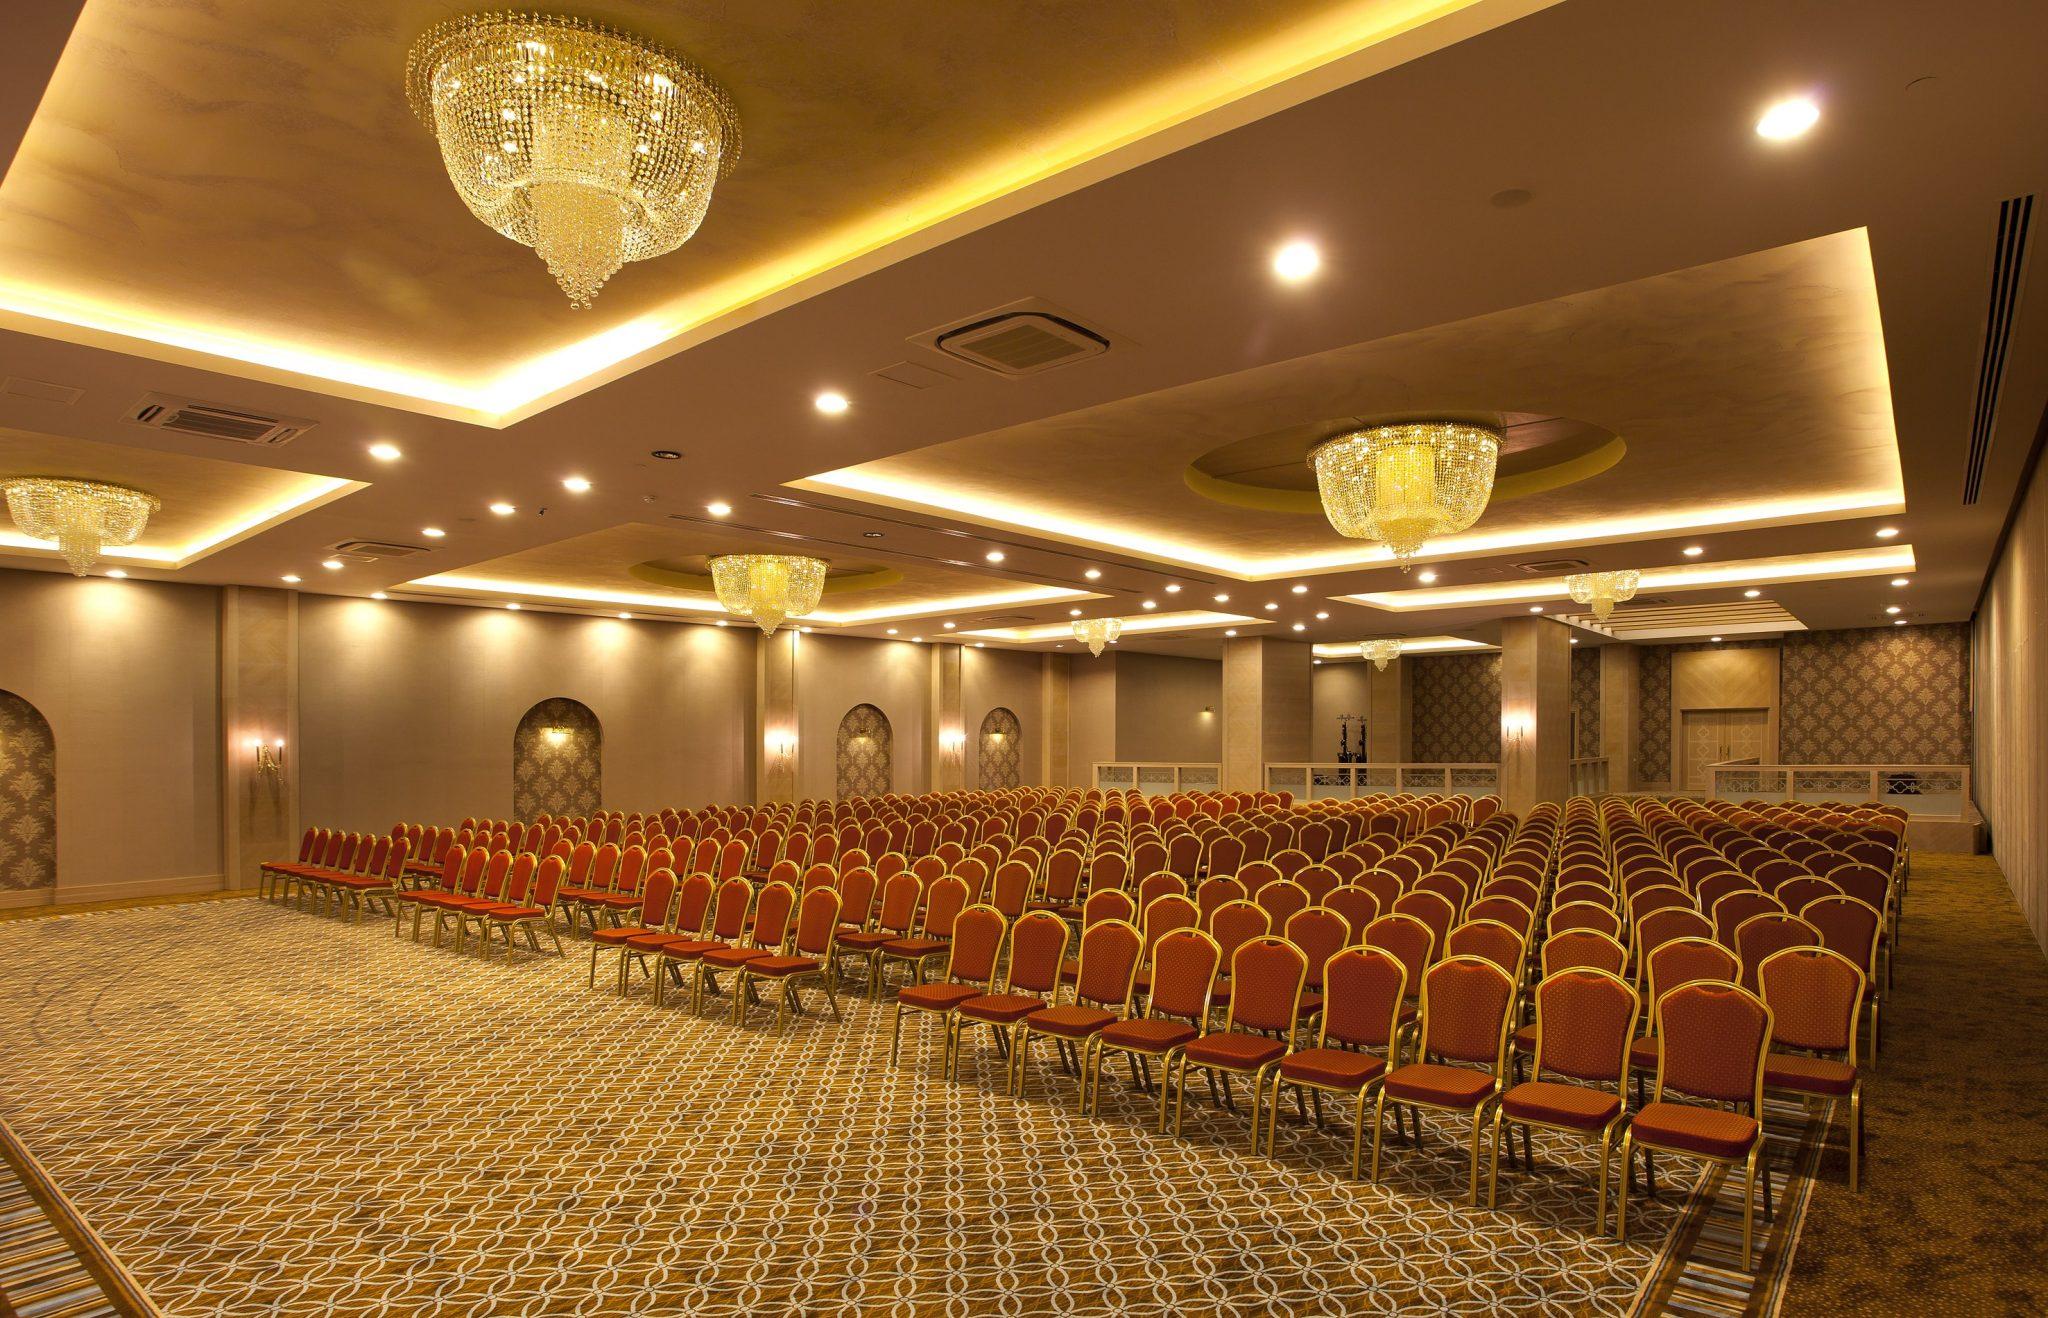 Letovanje_Turska_Hoteli_Avio_Antalija_Hotel_Royal_Holiday_Palace-29-scaled.jpg